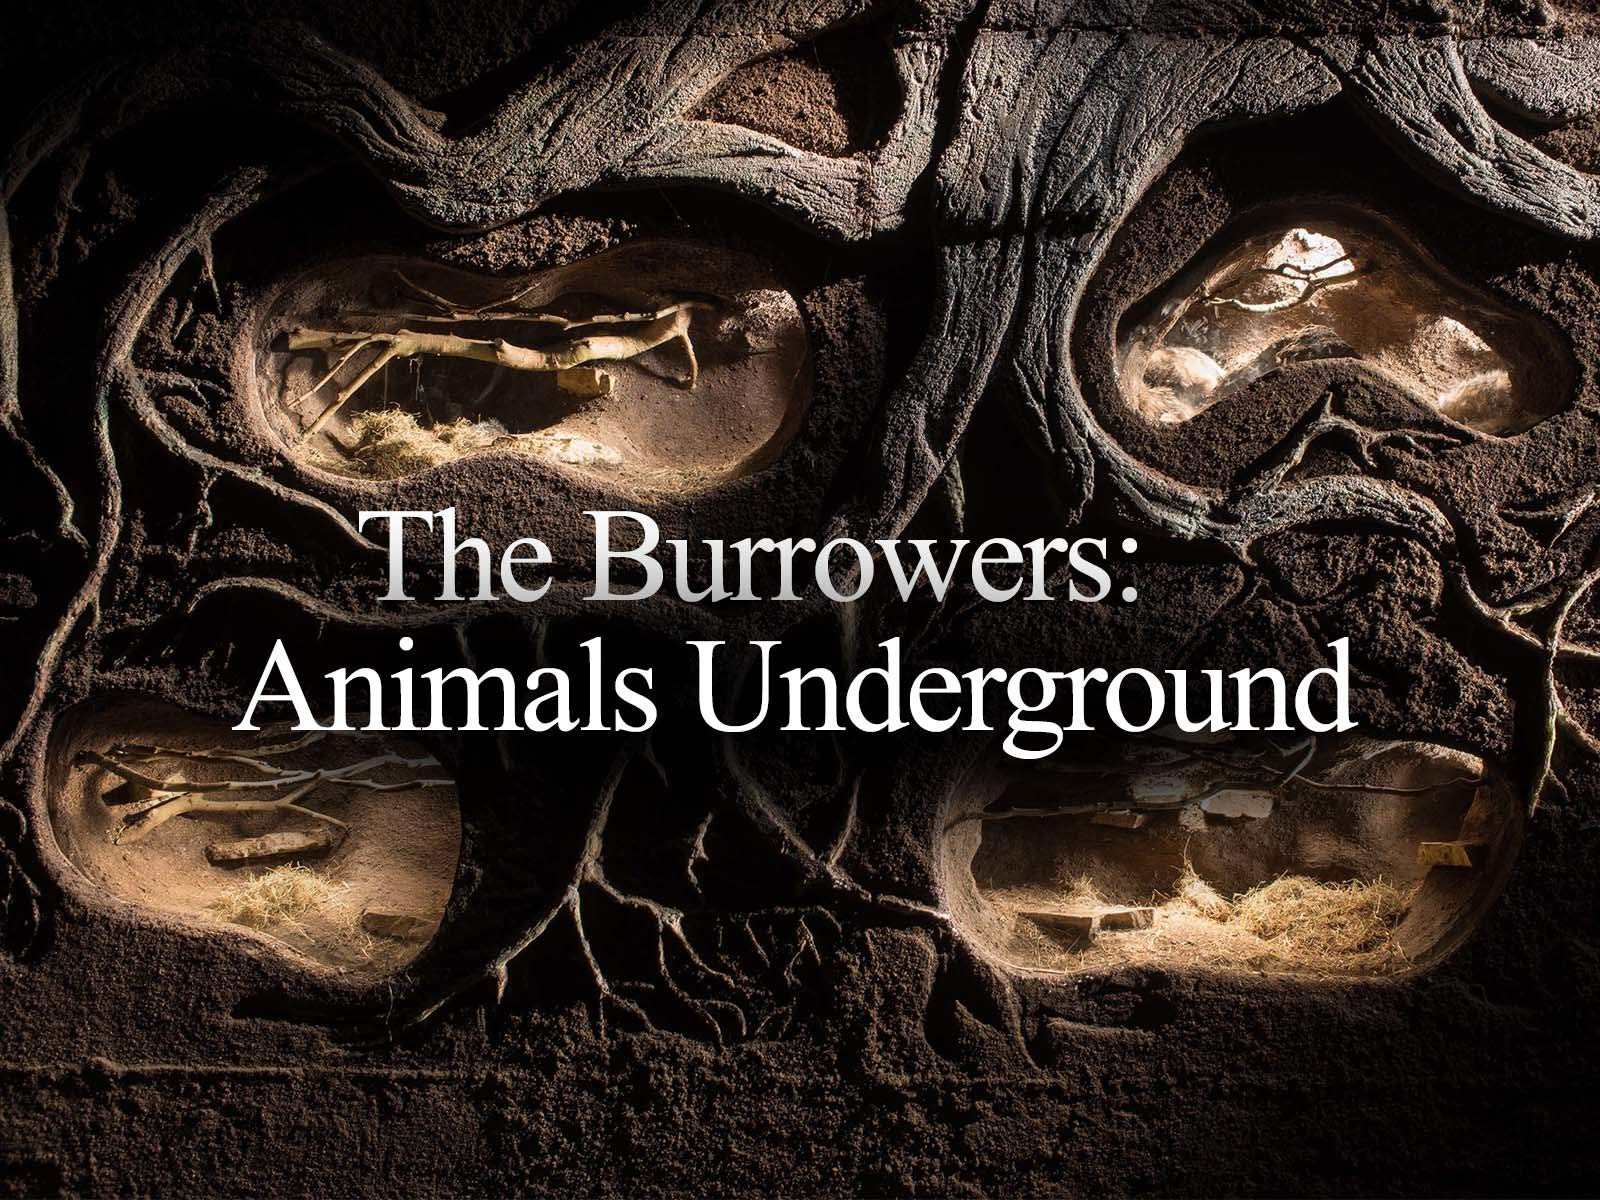 The Burrowers: Animals Underground - Season 1